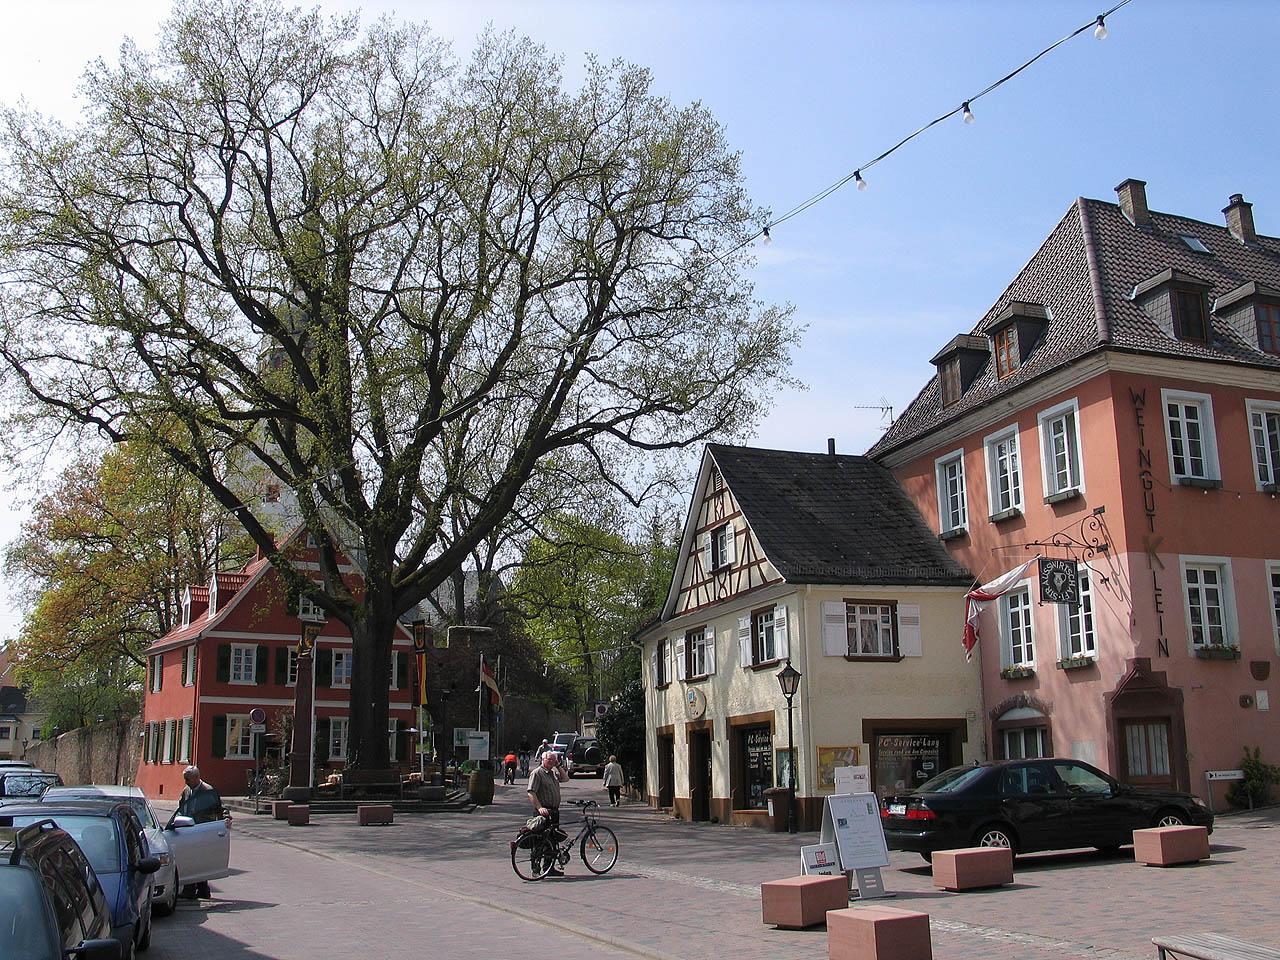 Nierstein Germany  City pictures : Nierstein Wikipedia, the free encyclopedia Alzey, Germany